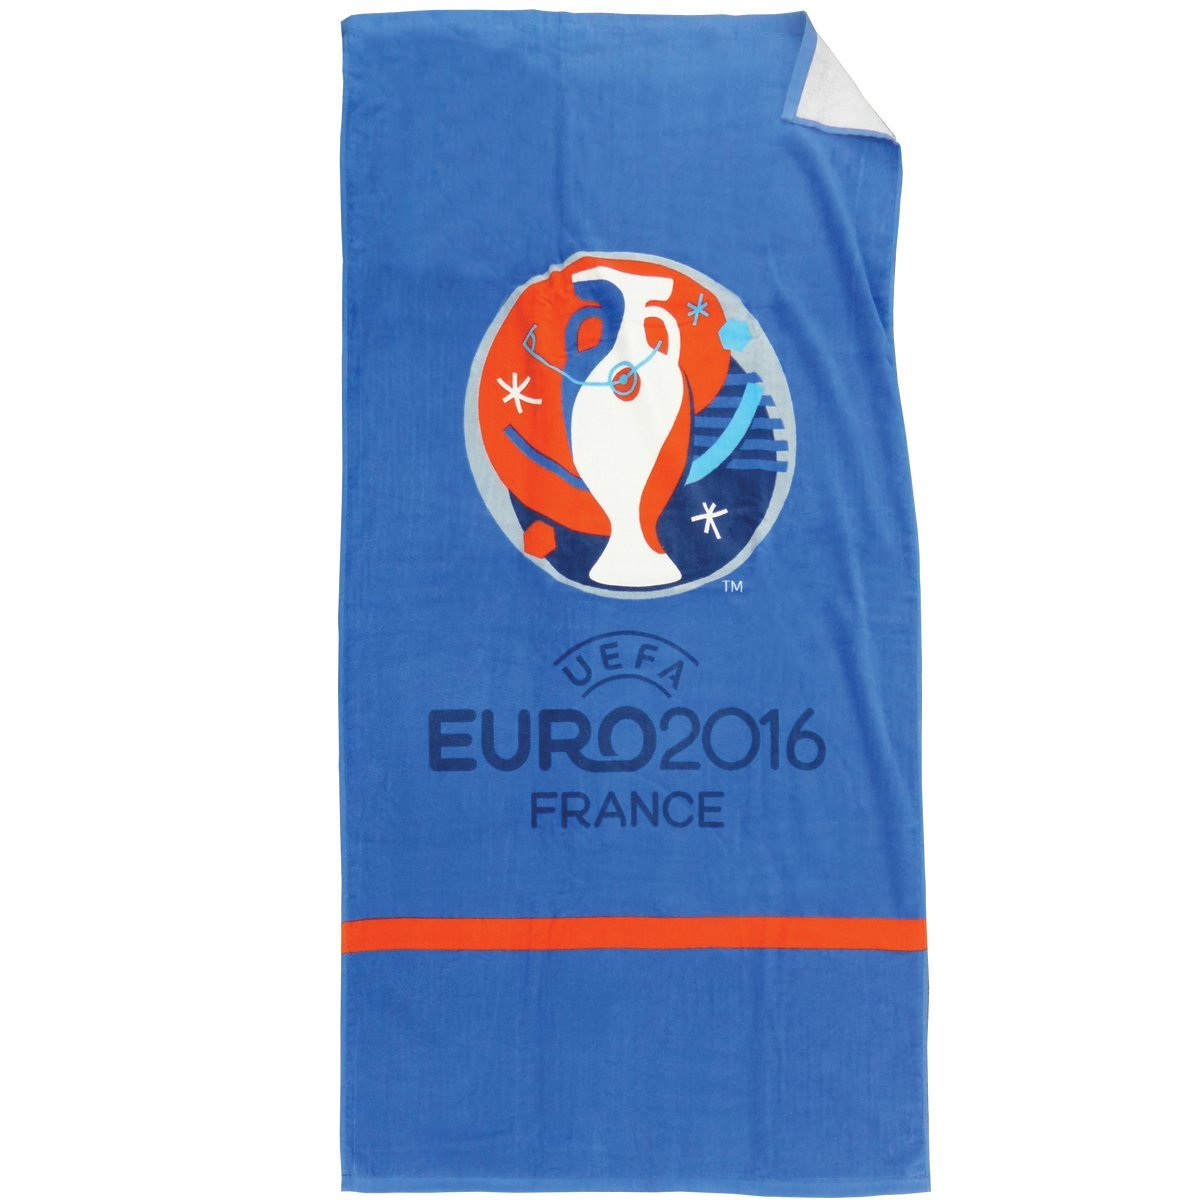 coupe europe football france serviette serviette. Black Bedroom Furniture Sets. Home Design Ideas